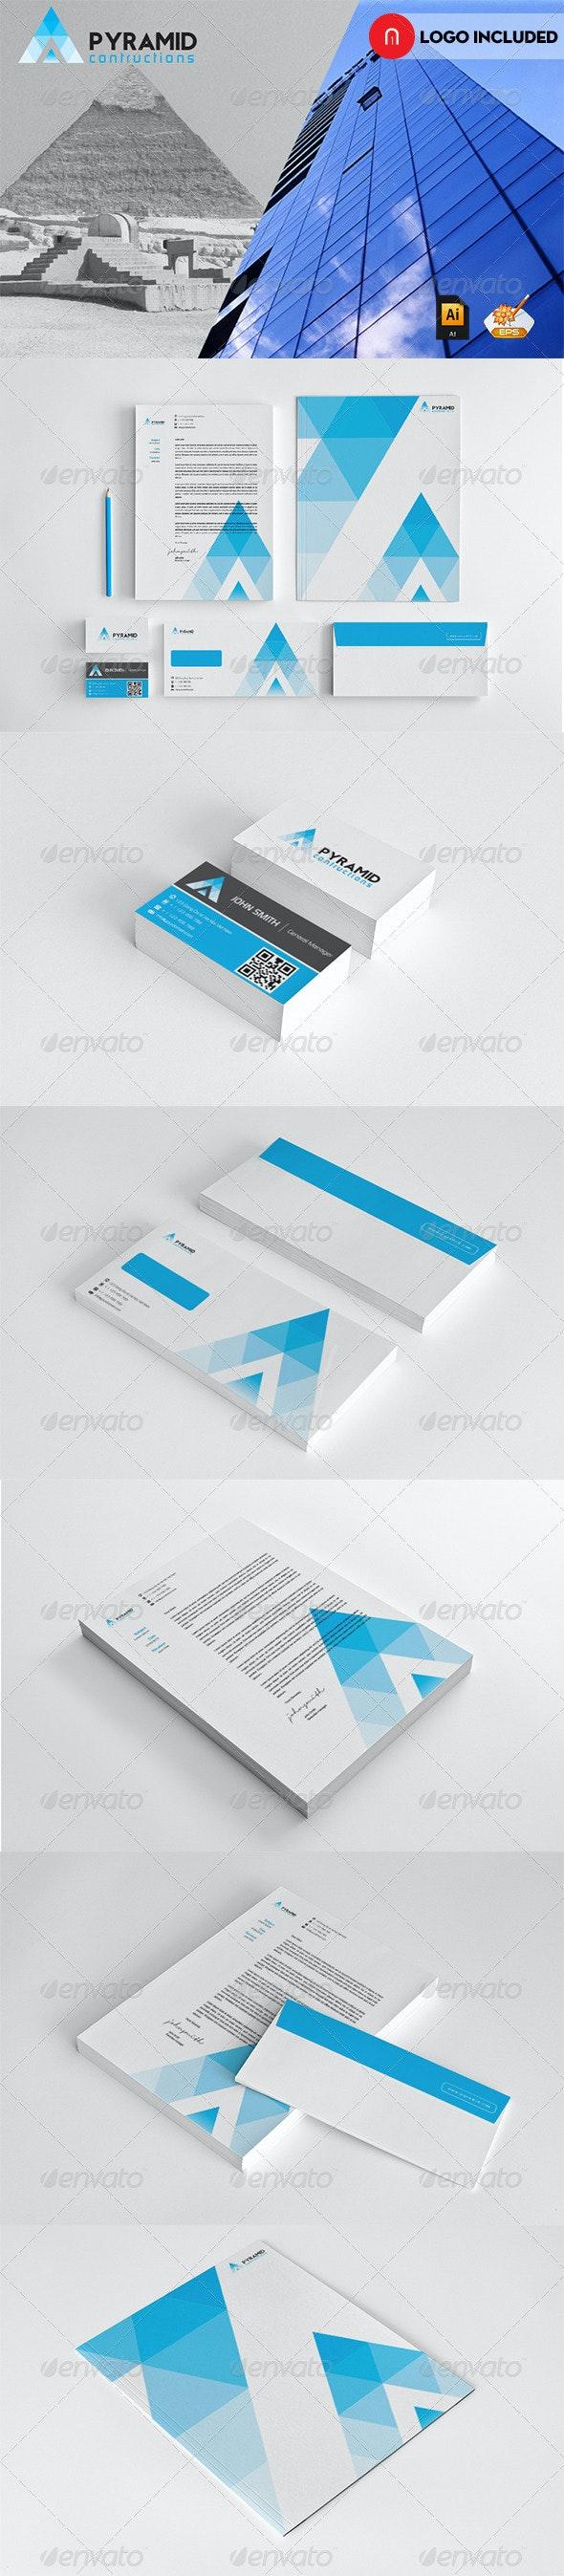 Corporate Startioney Pyramid Contruction - Stationery Print Templates